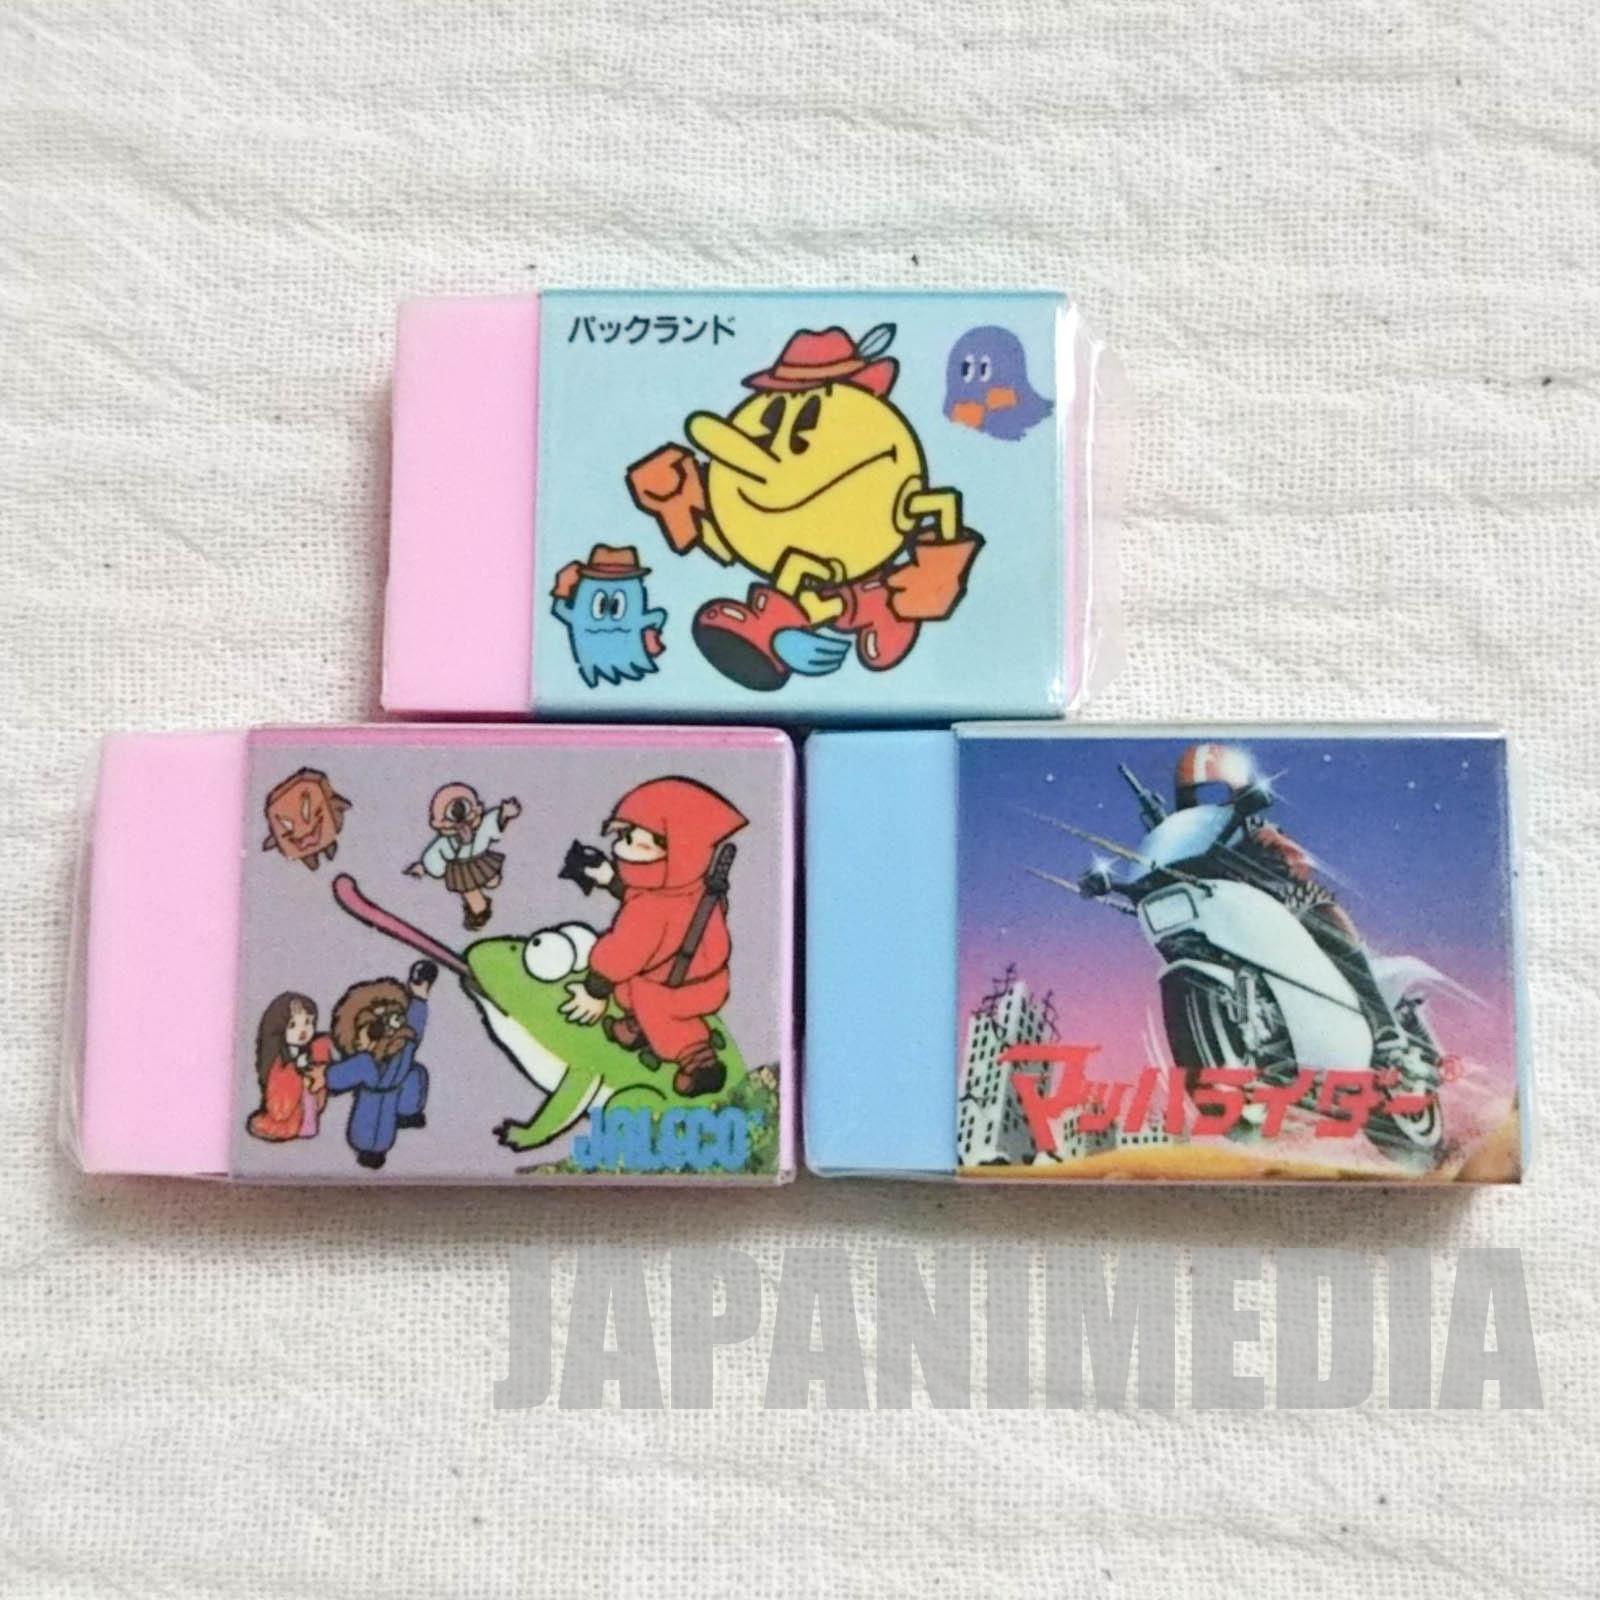 Retro RARE! Pac- Land / Ninja Jajamaru Kun / Mach rider Eraser  3pc JAPAN NES FAMICOM